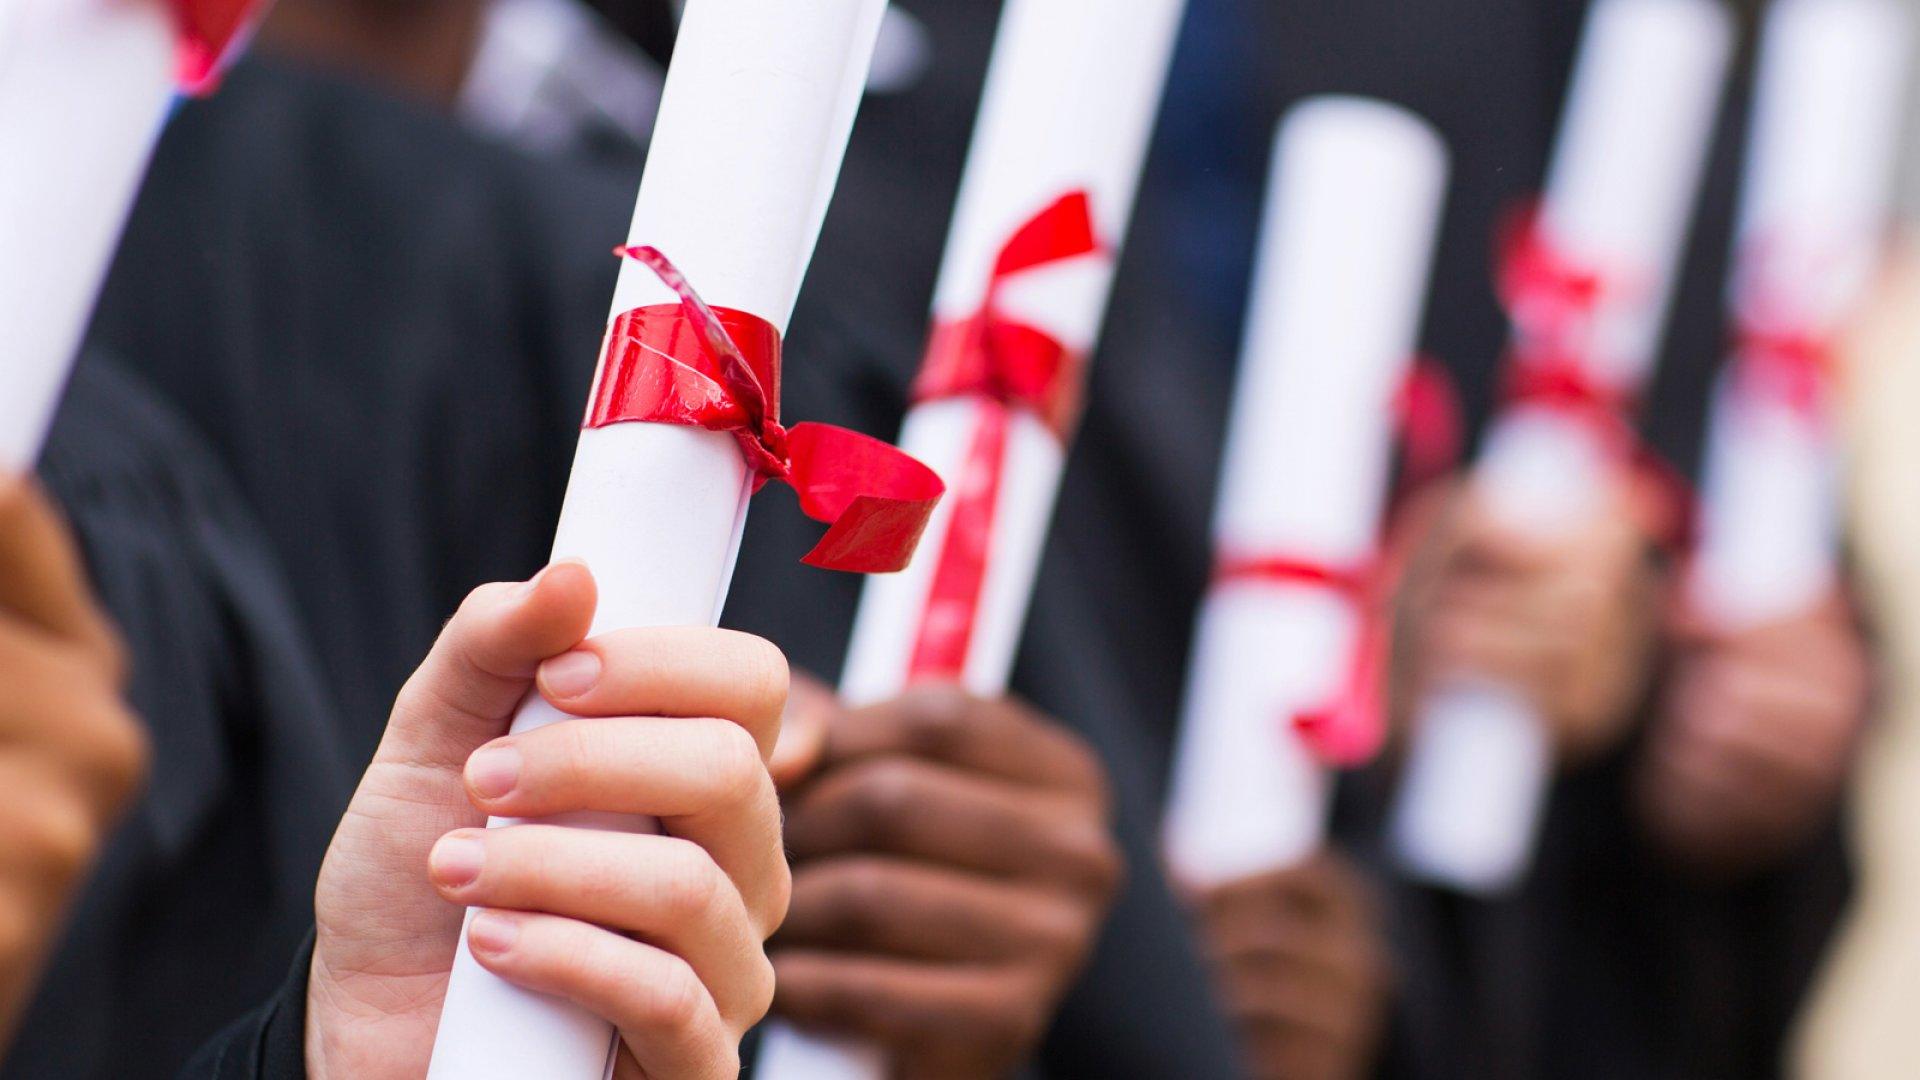 Is Student Debt Putting the Brakes on Gen Y's Entrepreneurial Dreams?